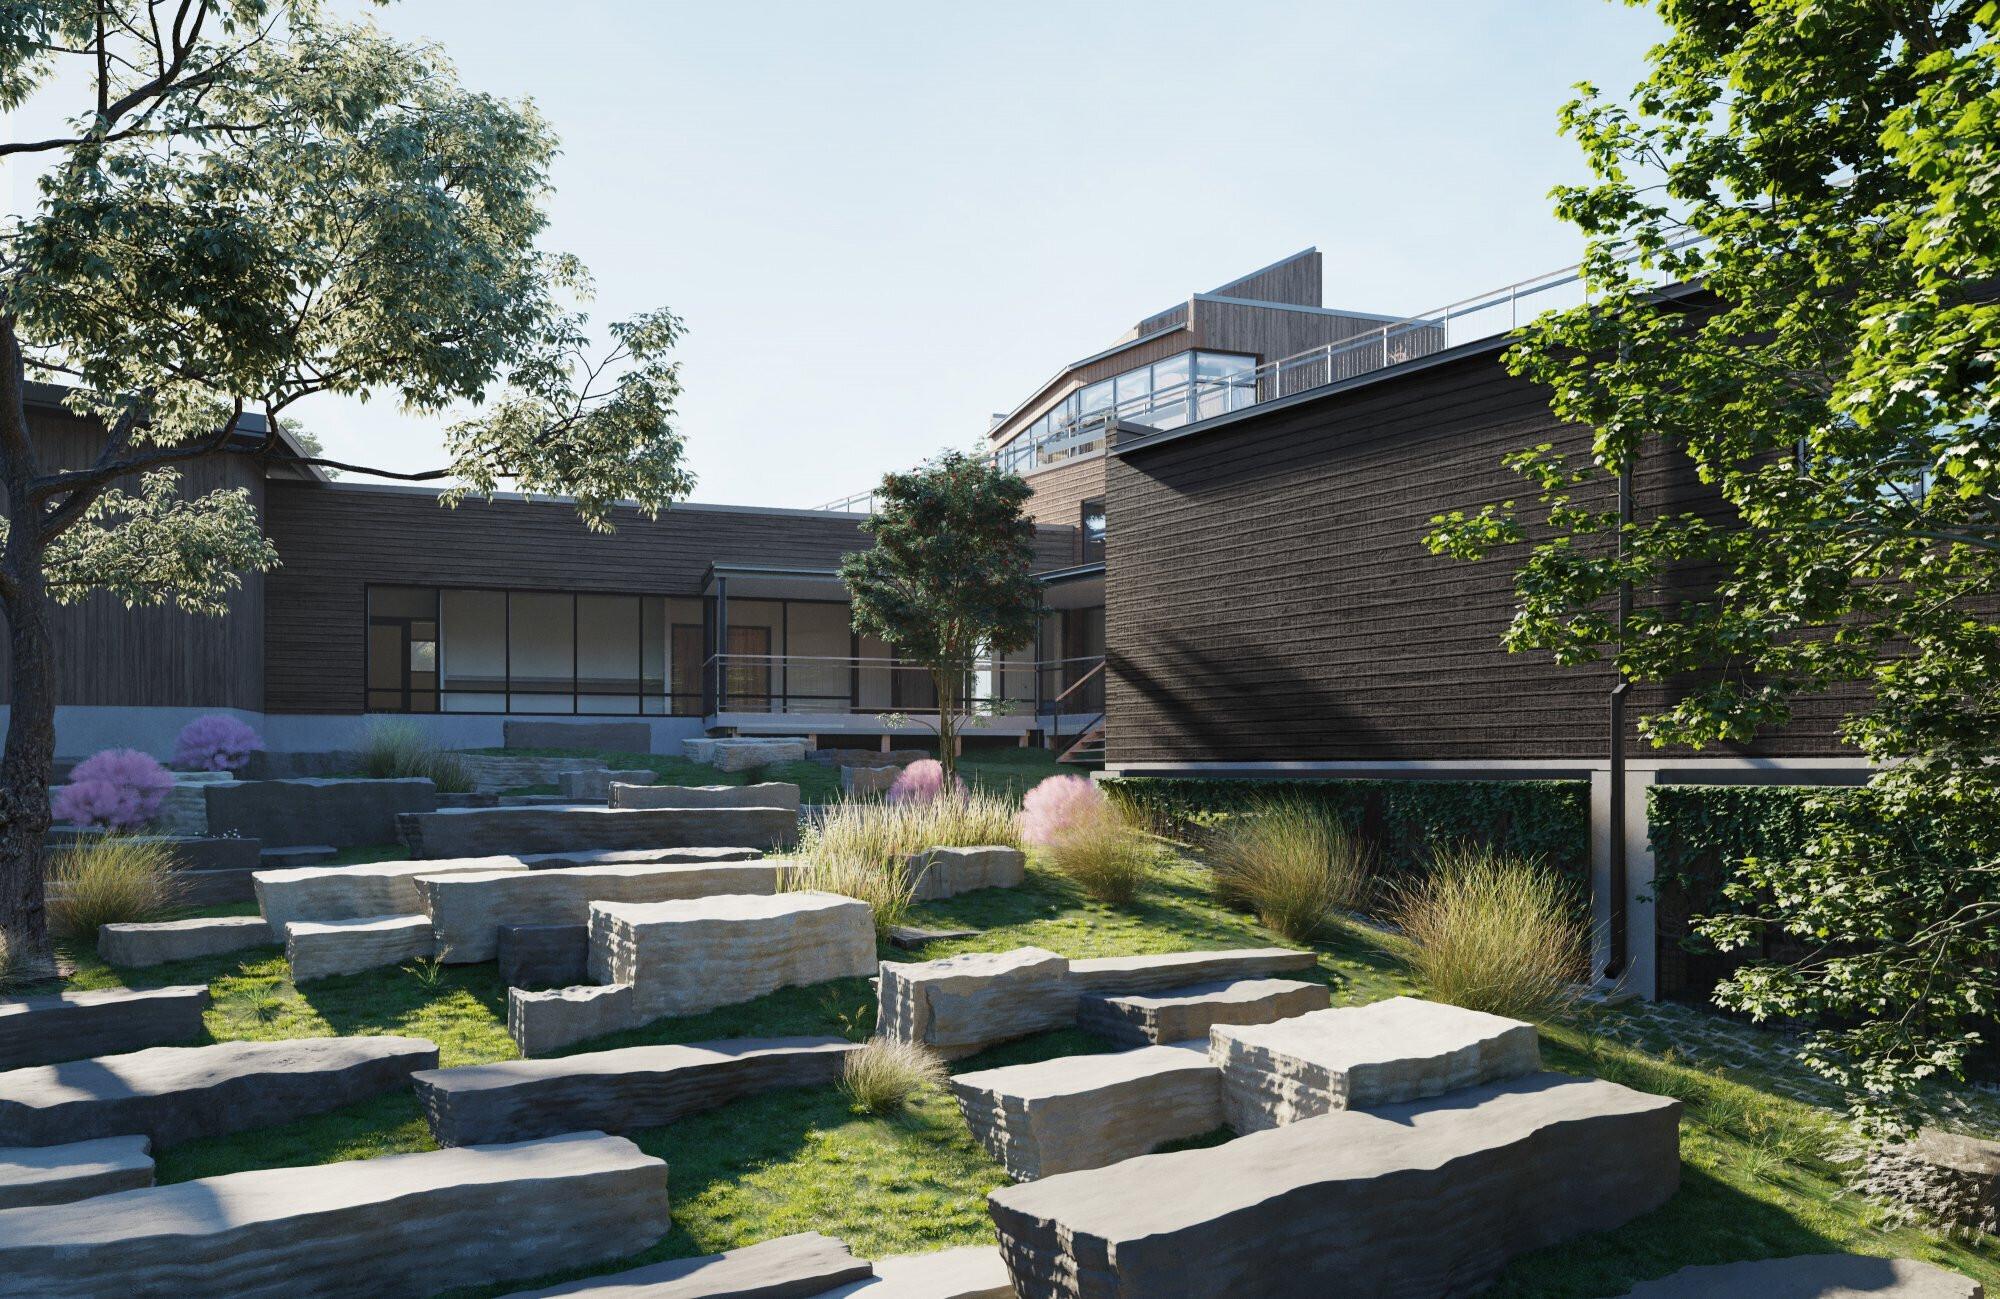 shawnee-outdoor-learning-center-garden